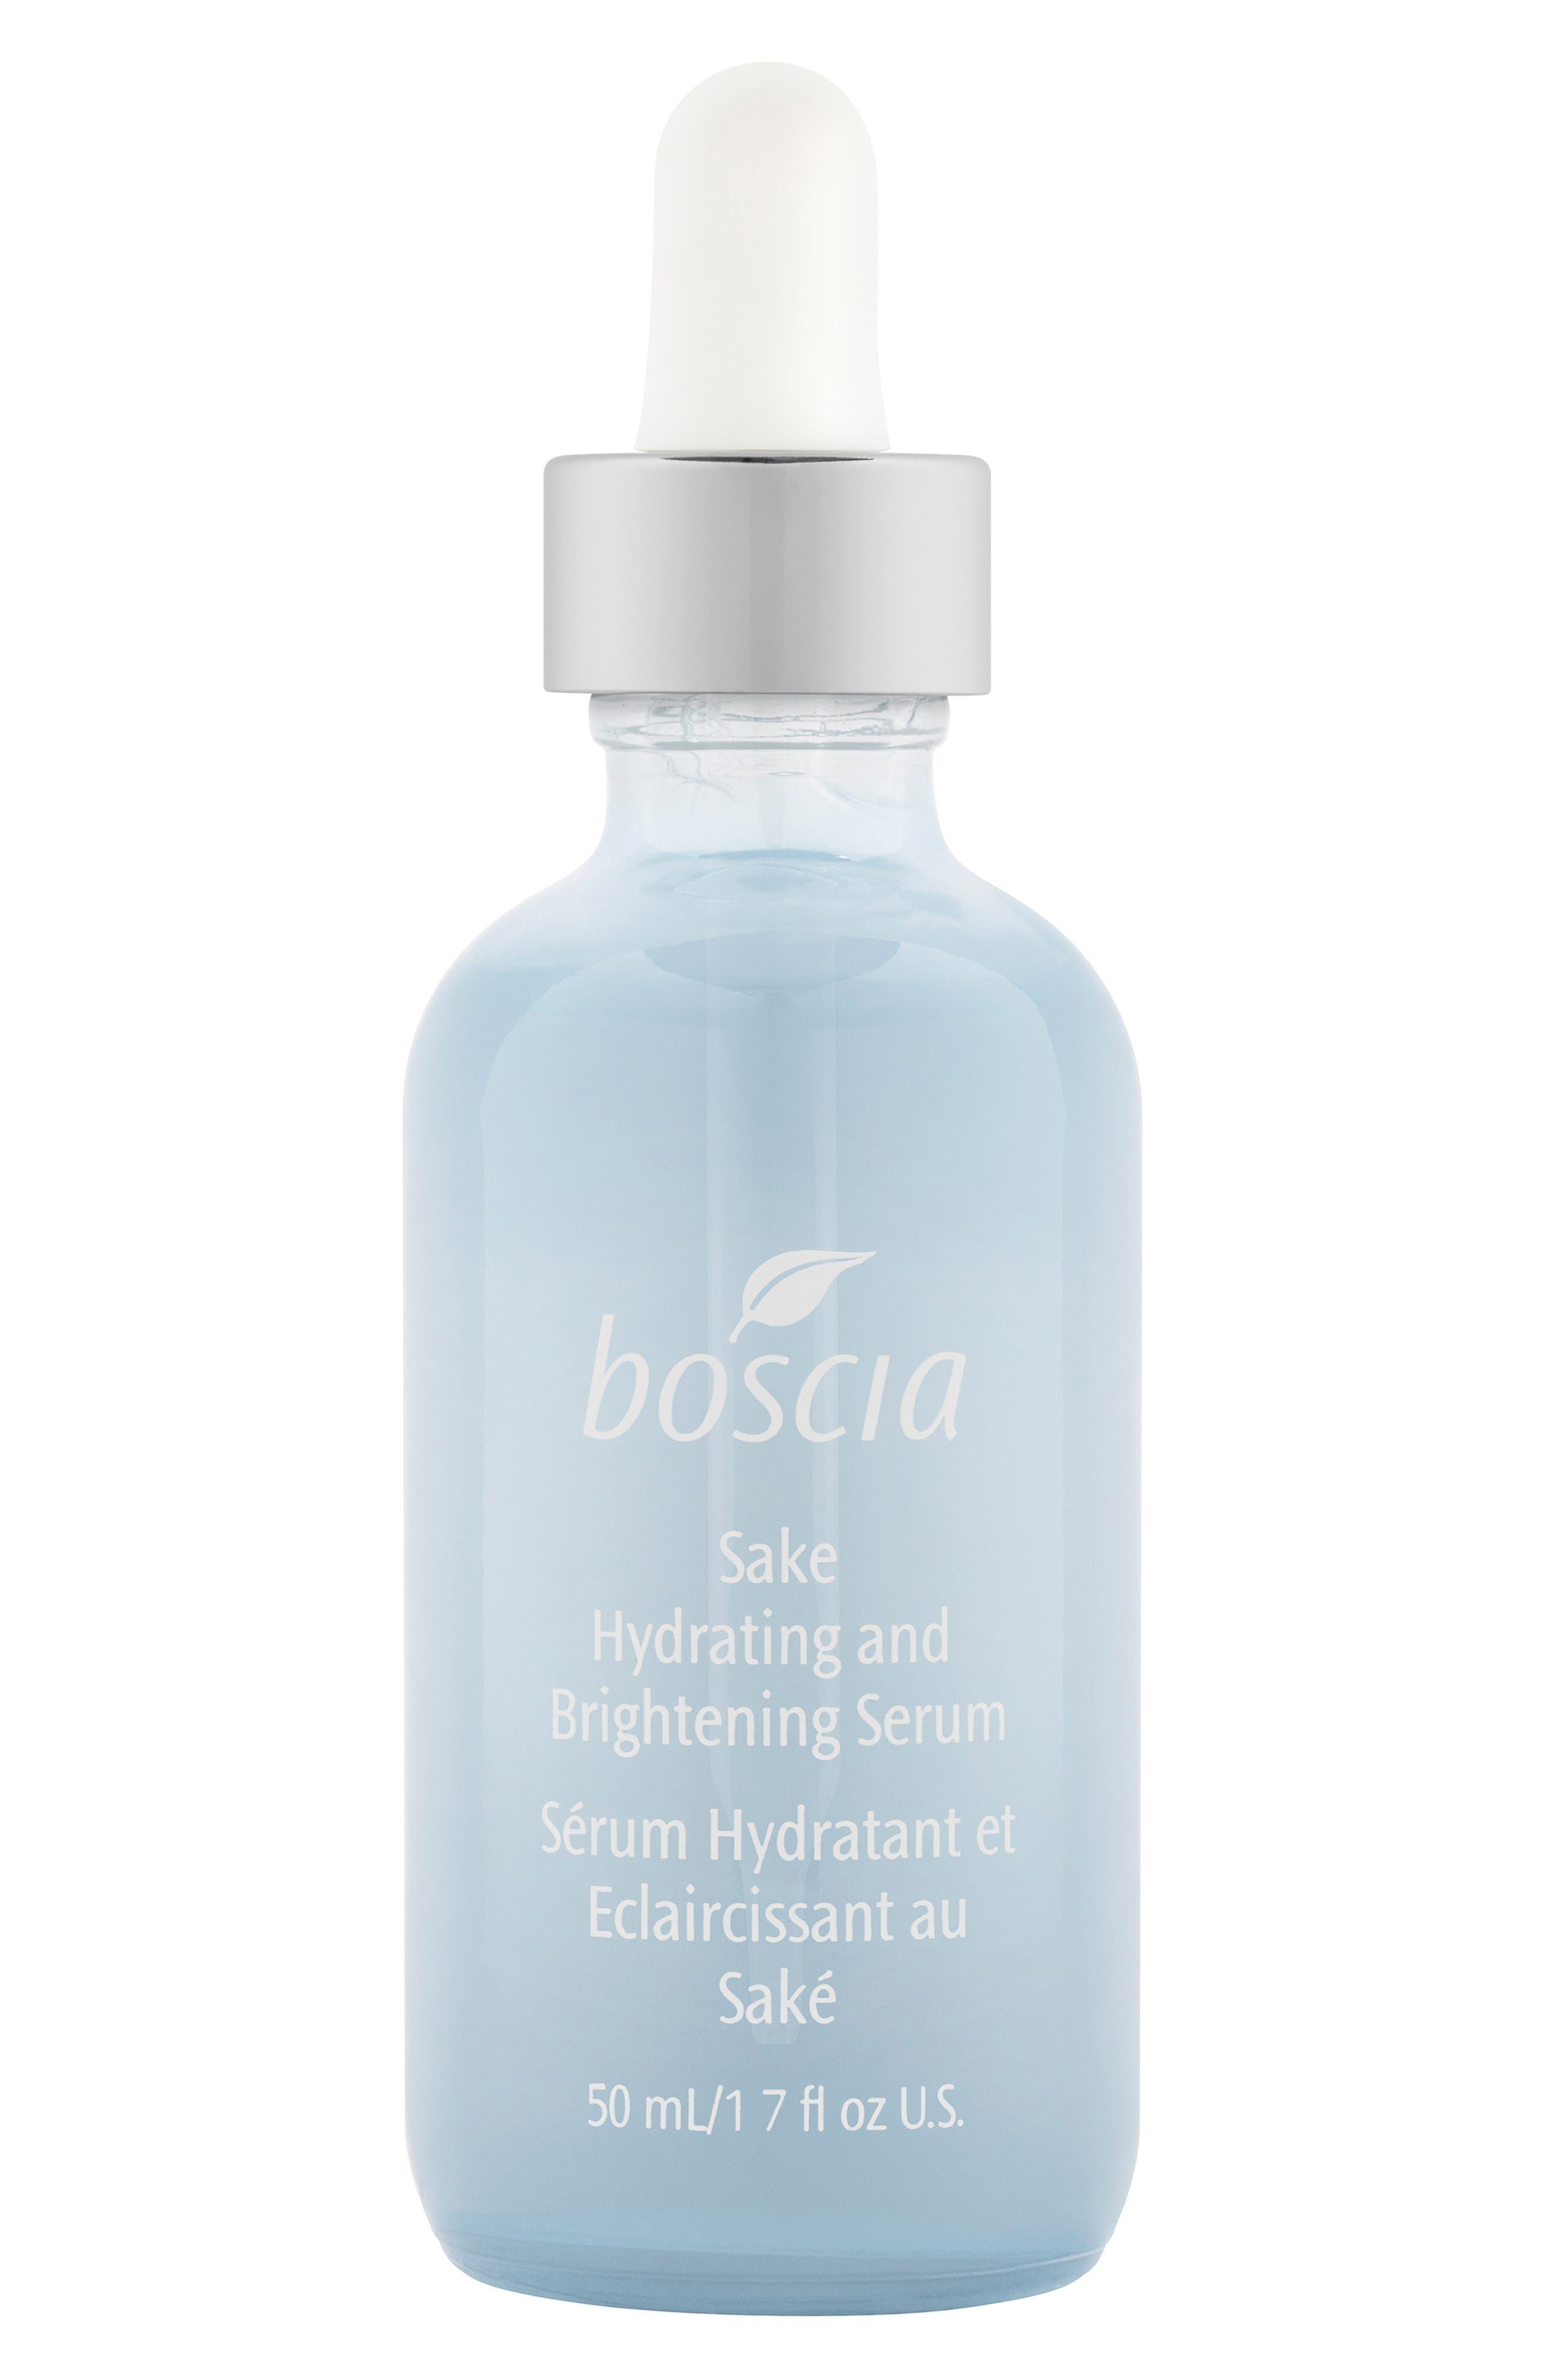 BOSCIA Sake Hydrating and Brightening Serum, Main, color, NO COLOR